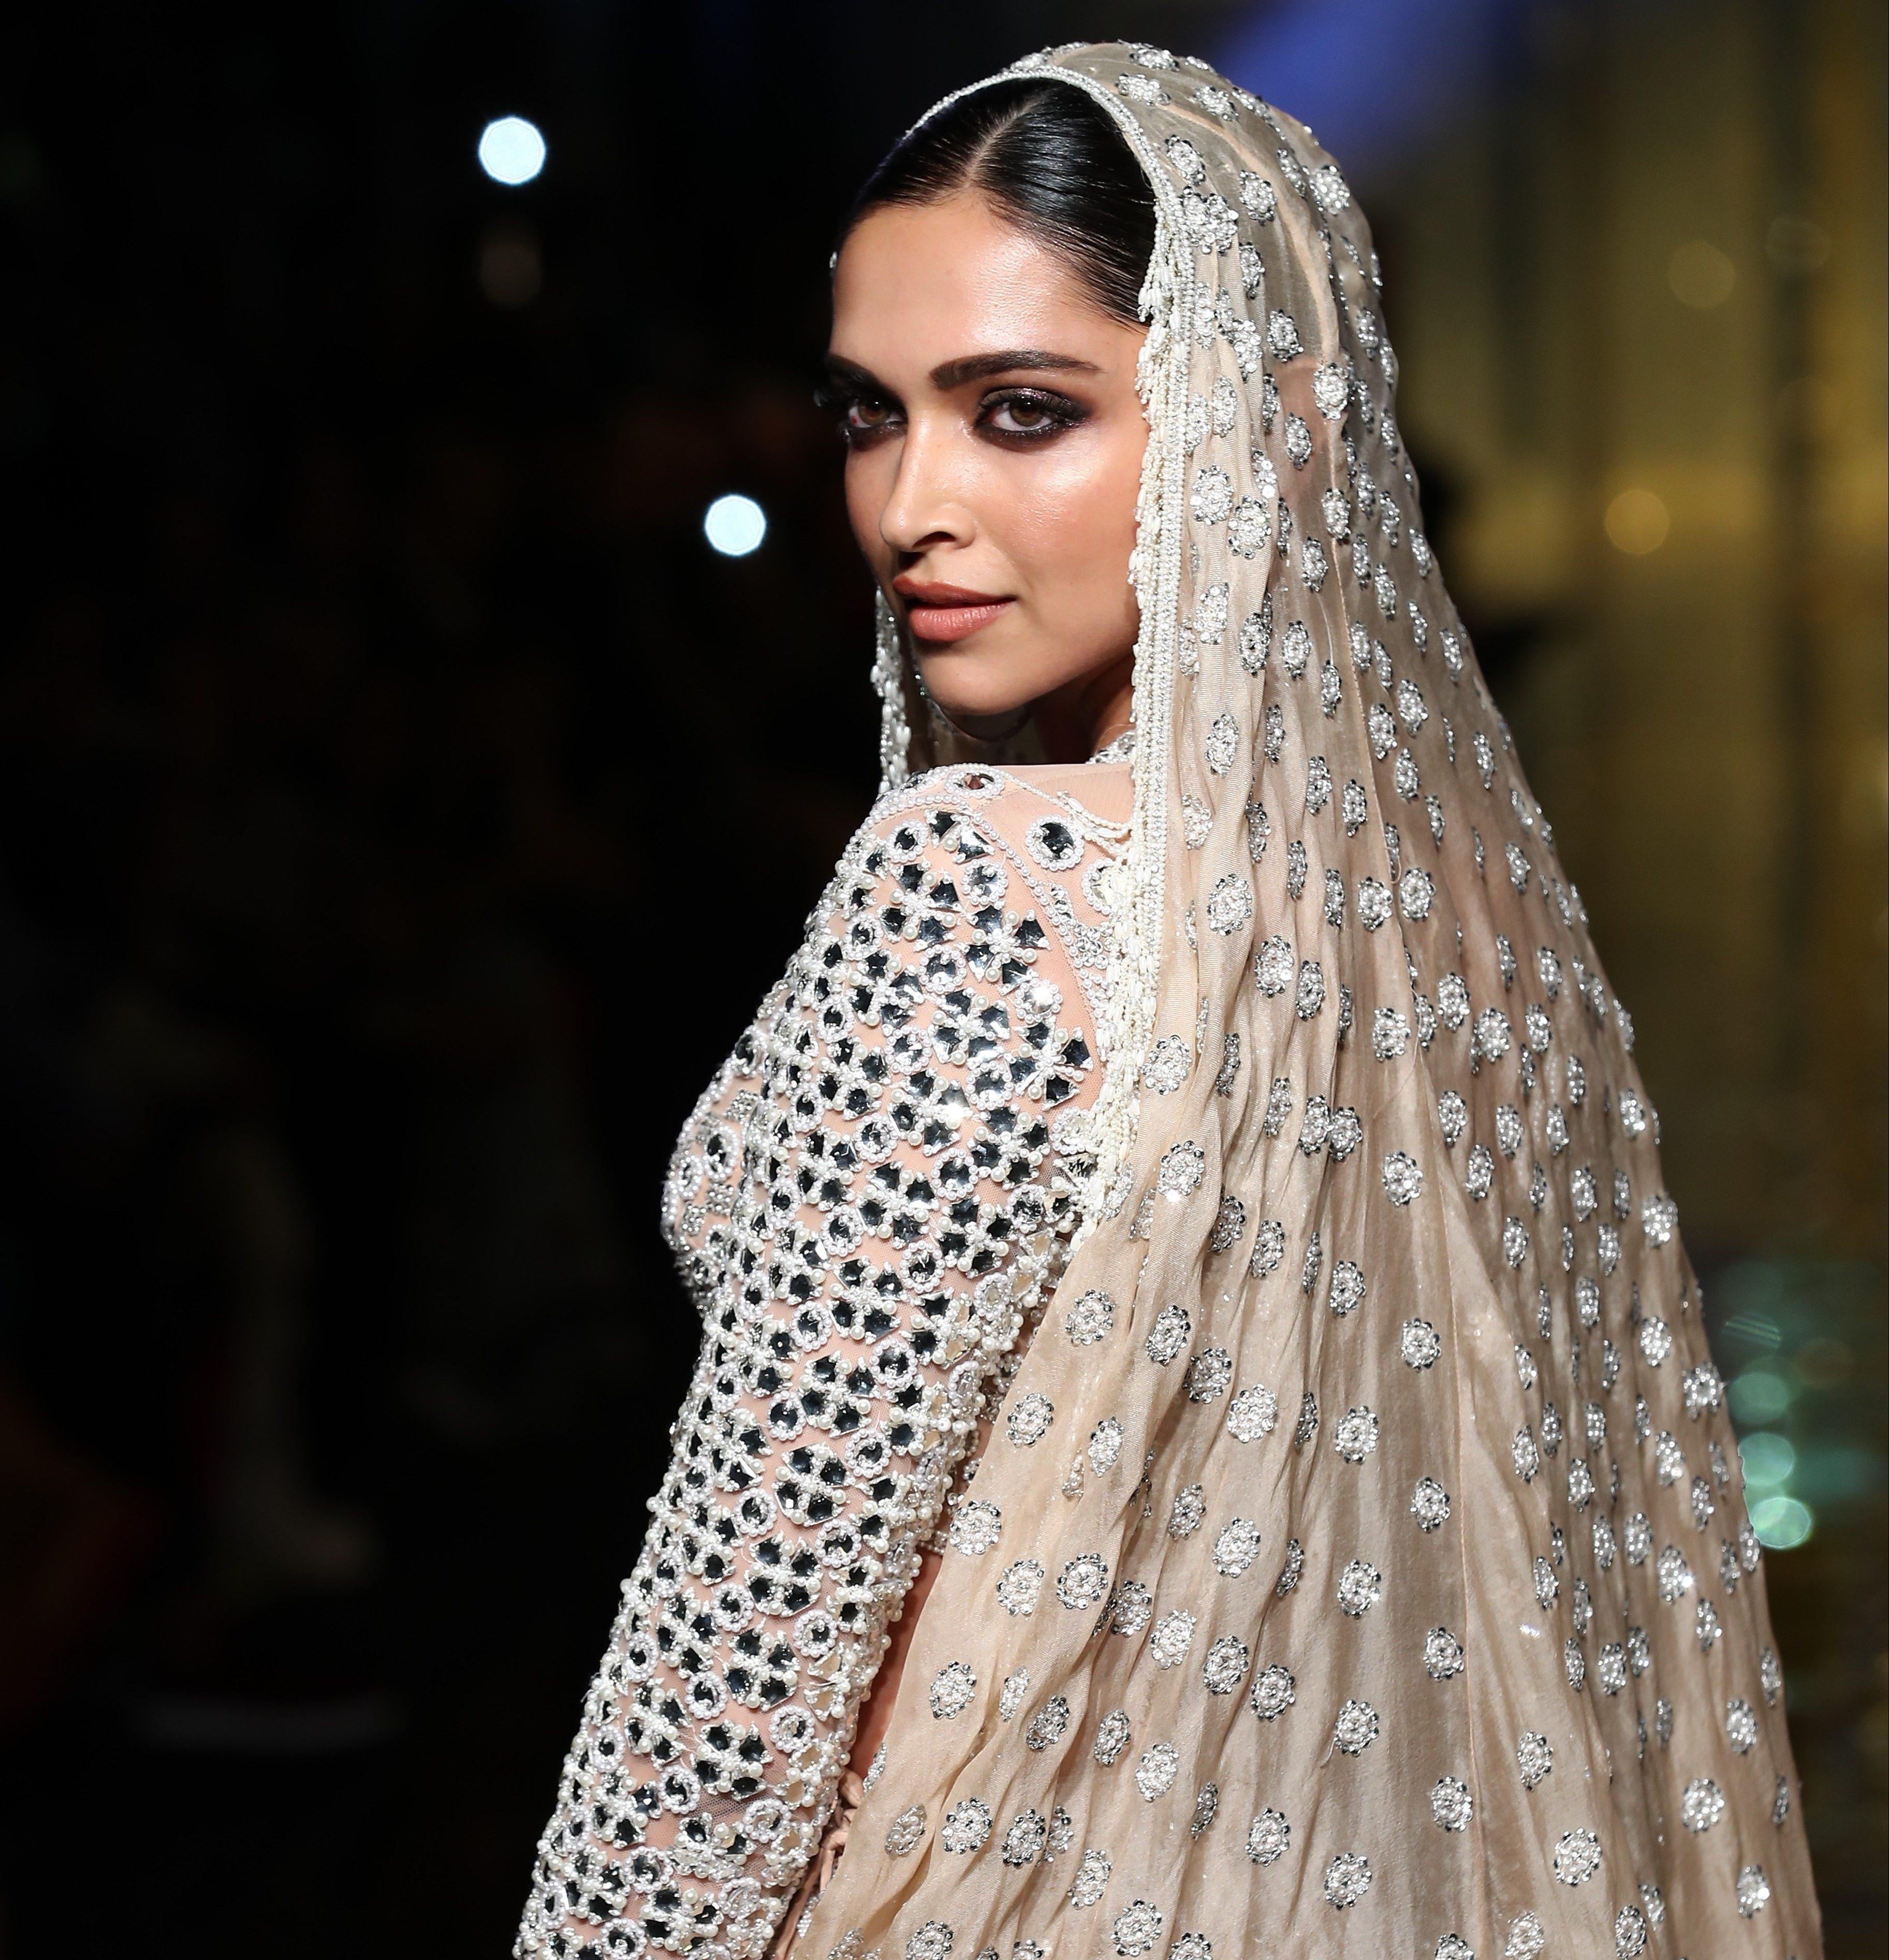 Deepika Padukone wearing Abu Jani Sandeep Khosla